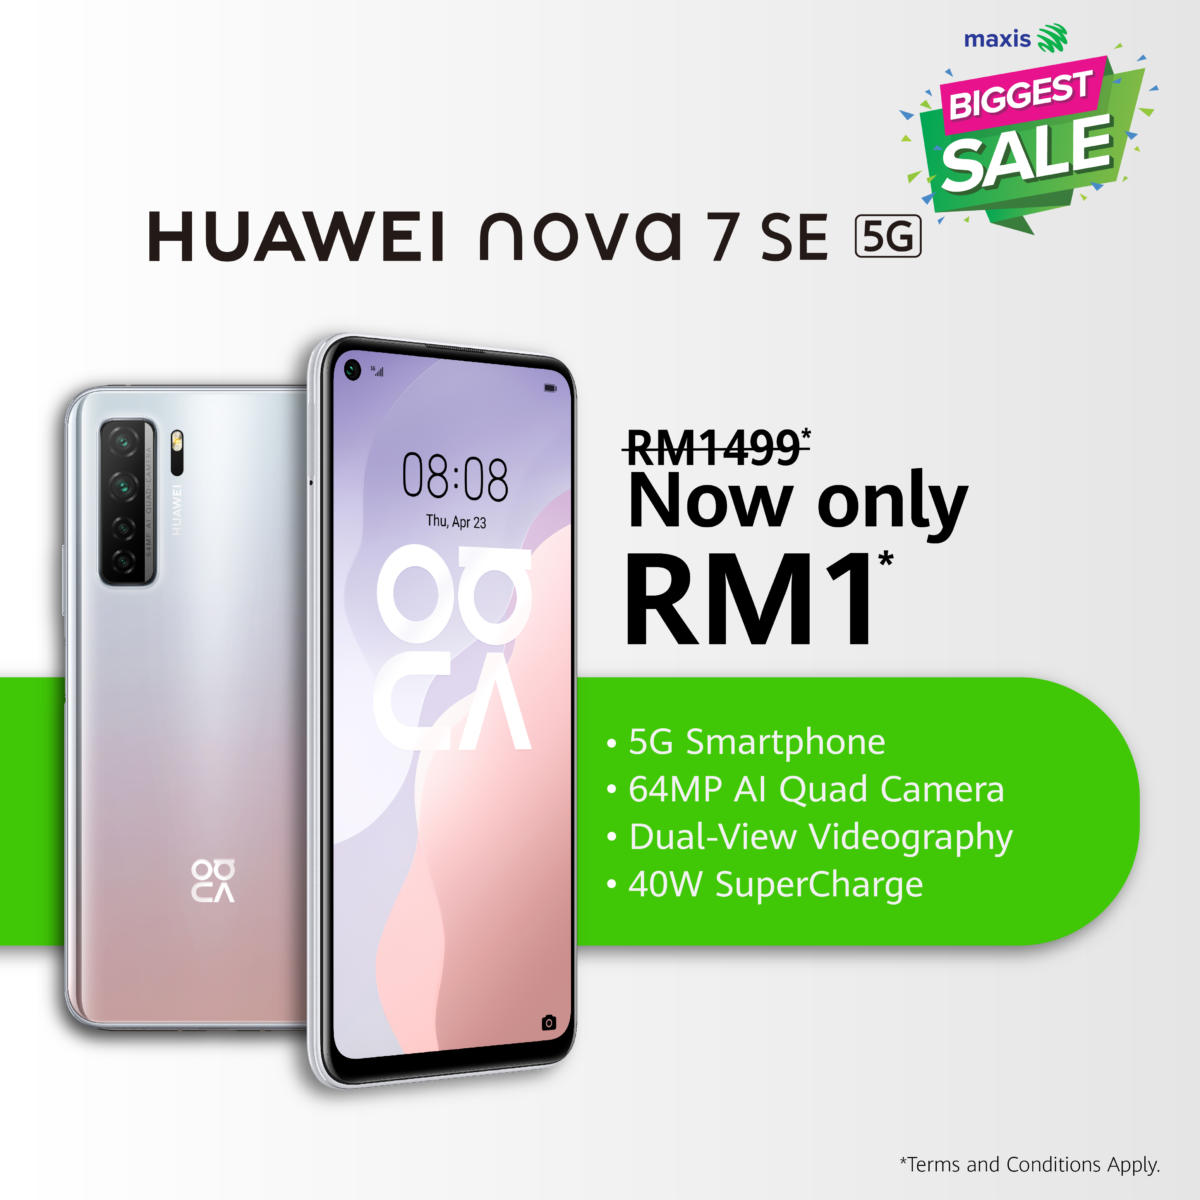 HUAWEI nova 7 SE Maxis Biggest Sale